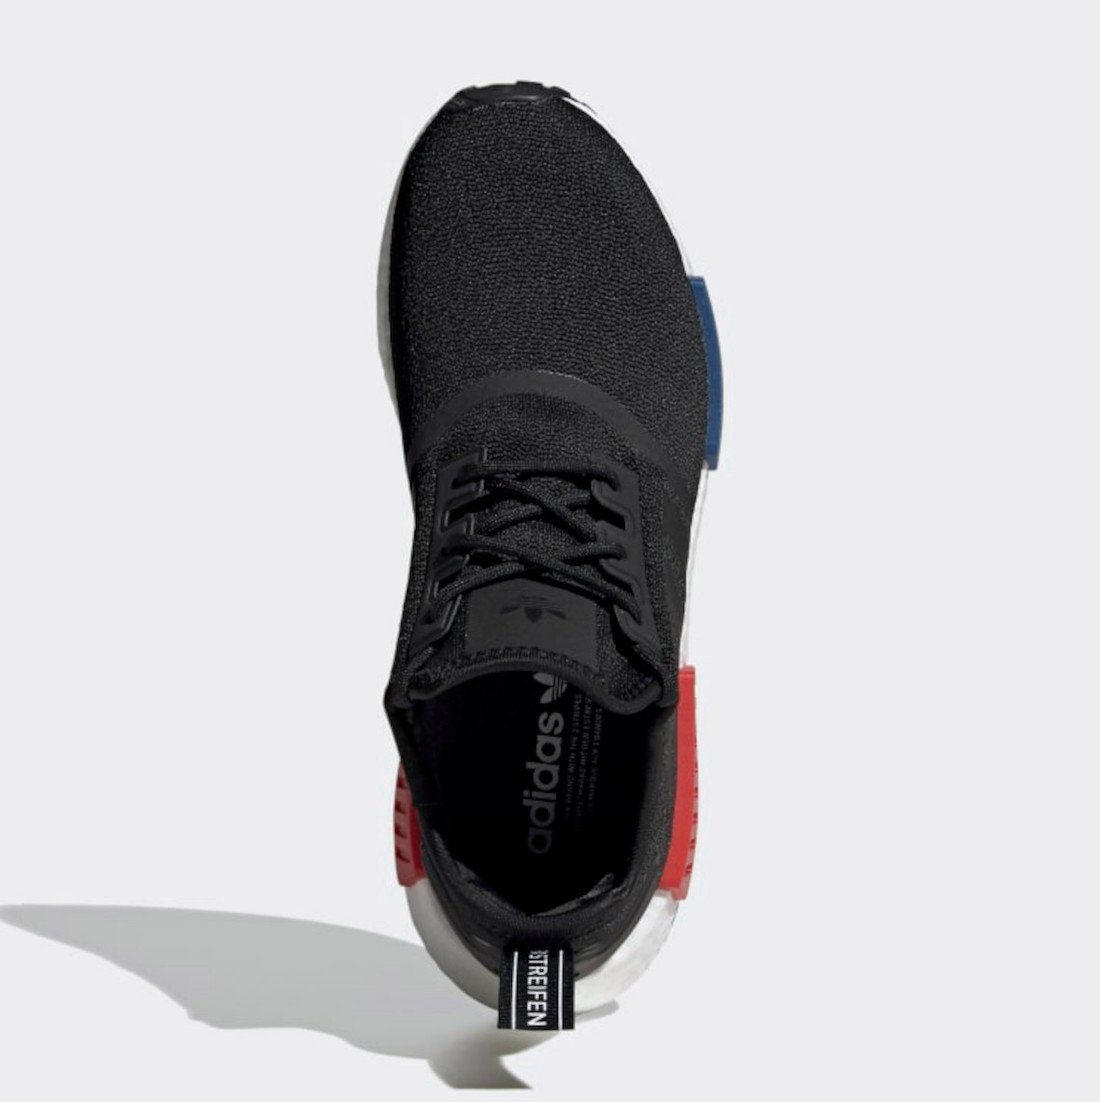 adidas NMD R1 OG Black Red Blue GZ7922 Release Date Info